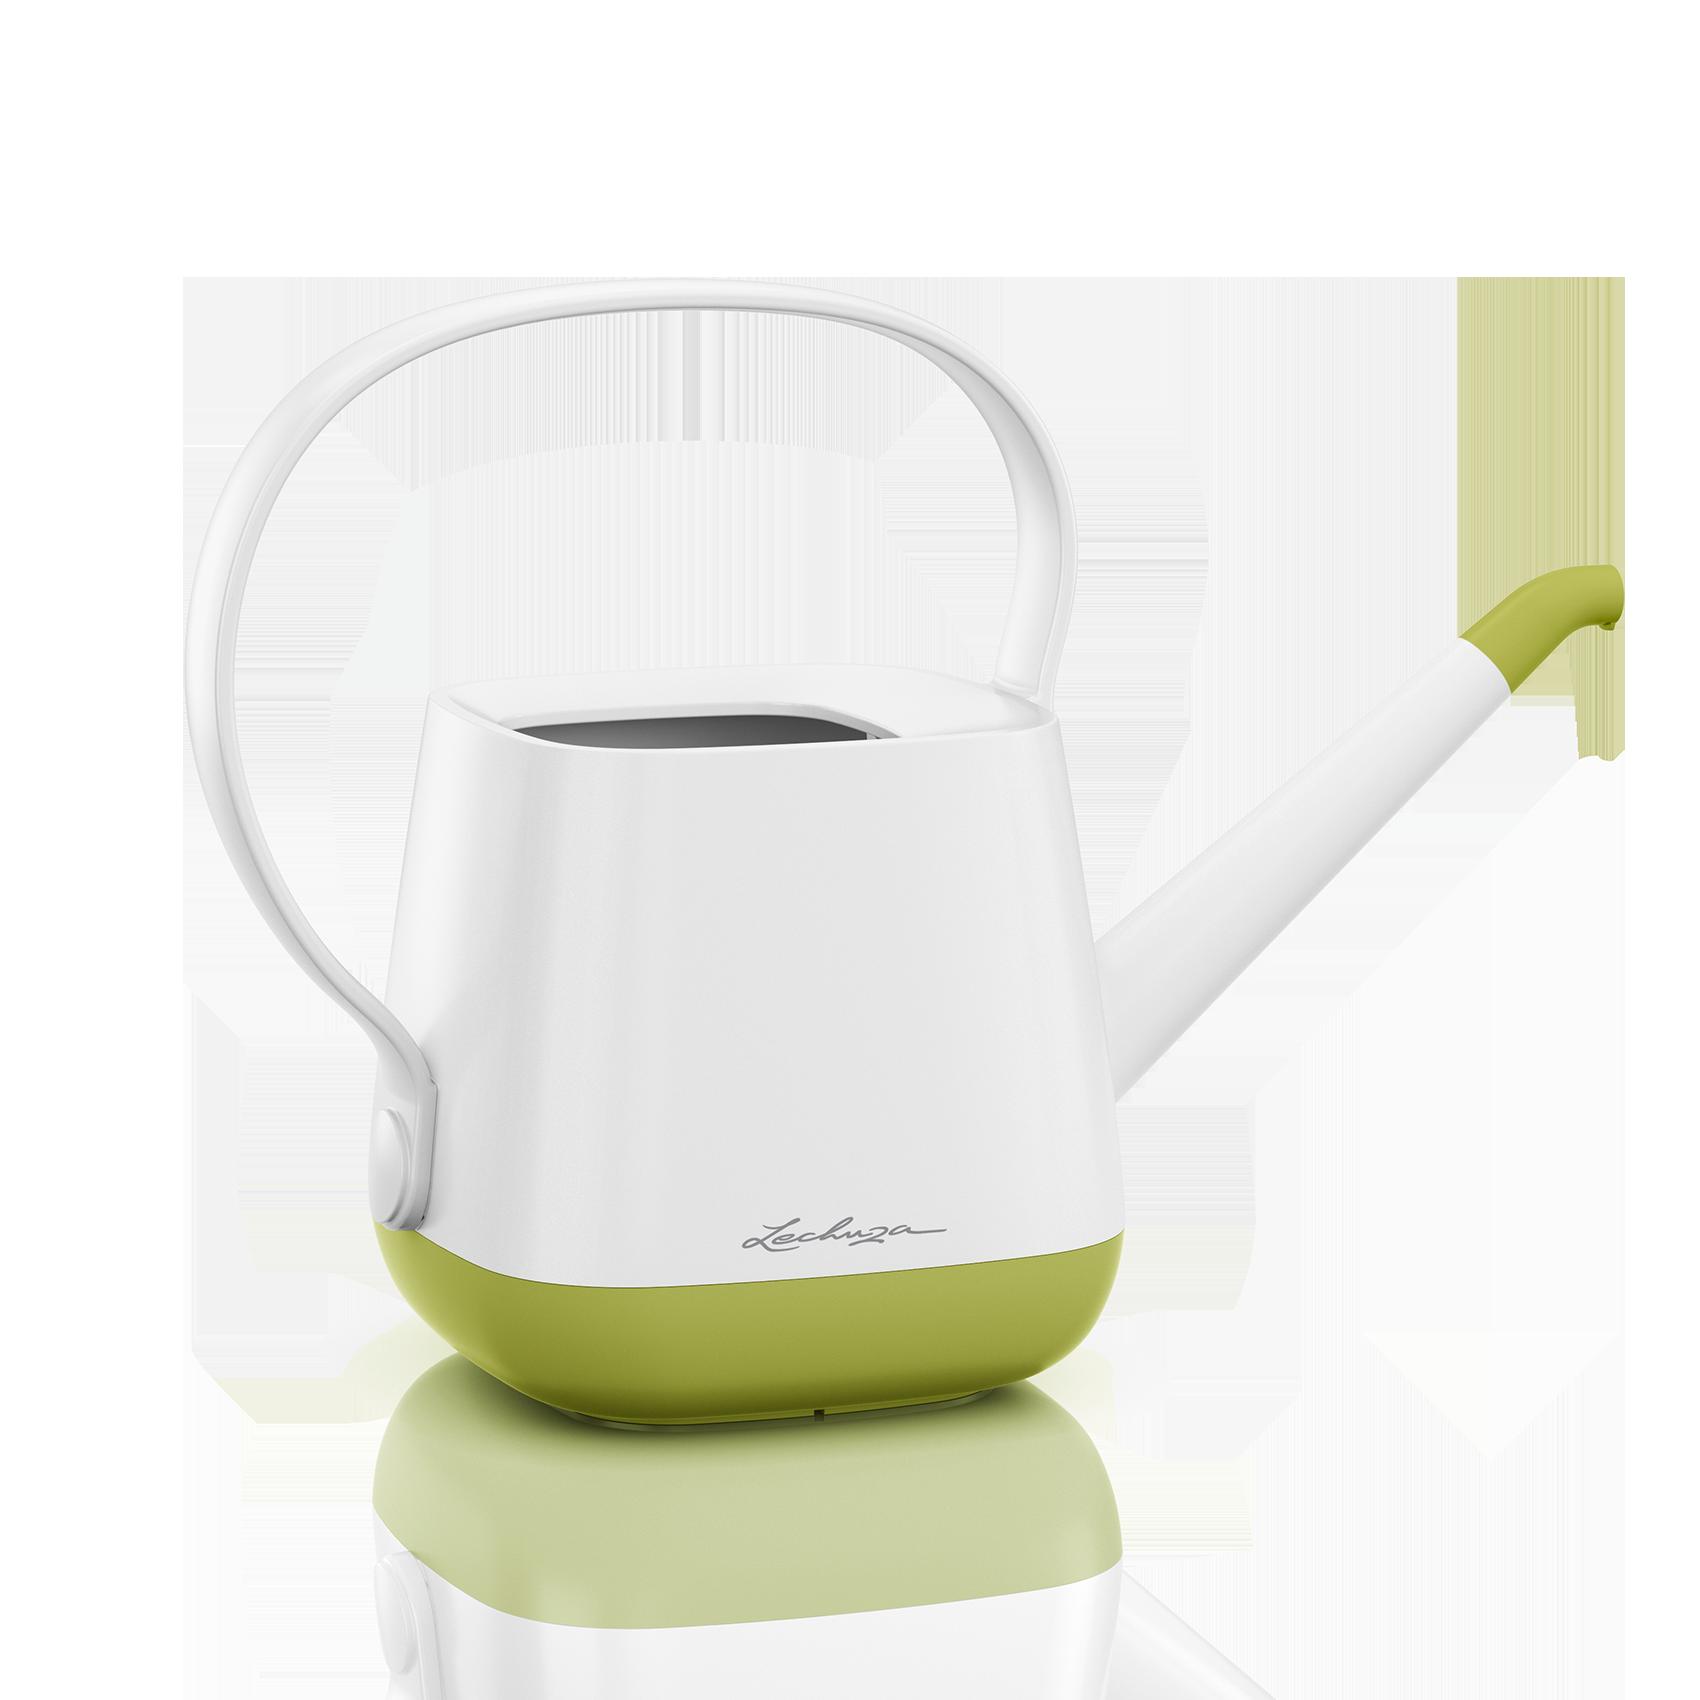 YULA watering can white/pistachio semi-gloss